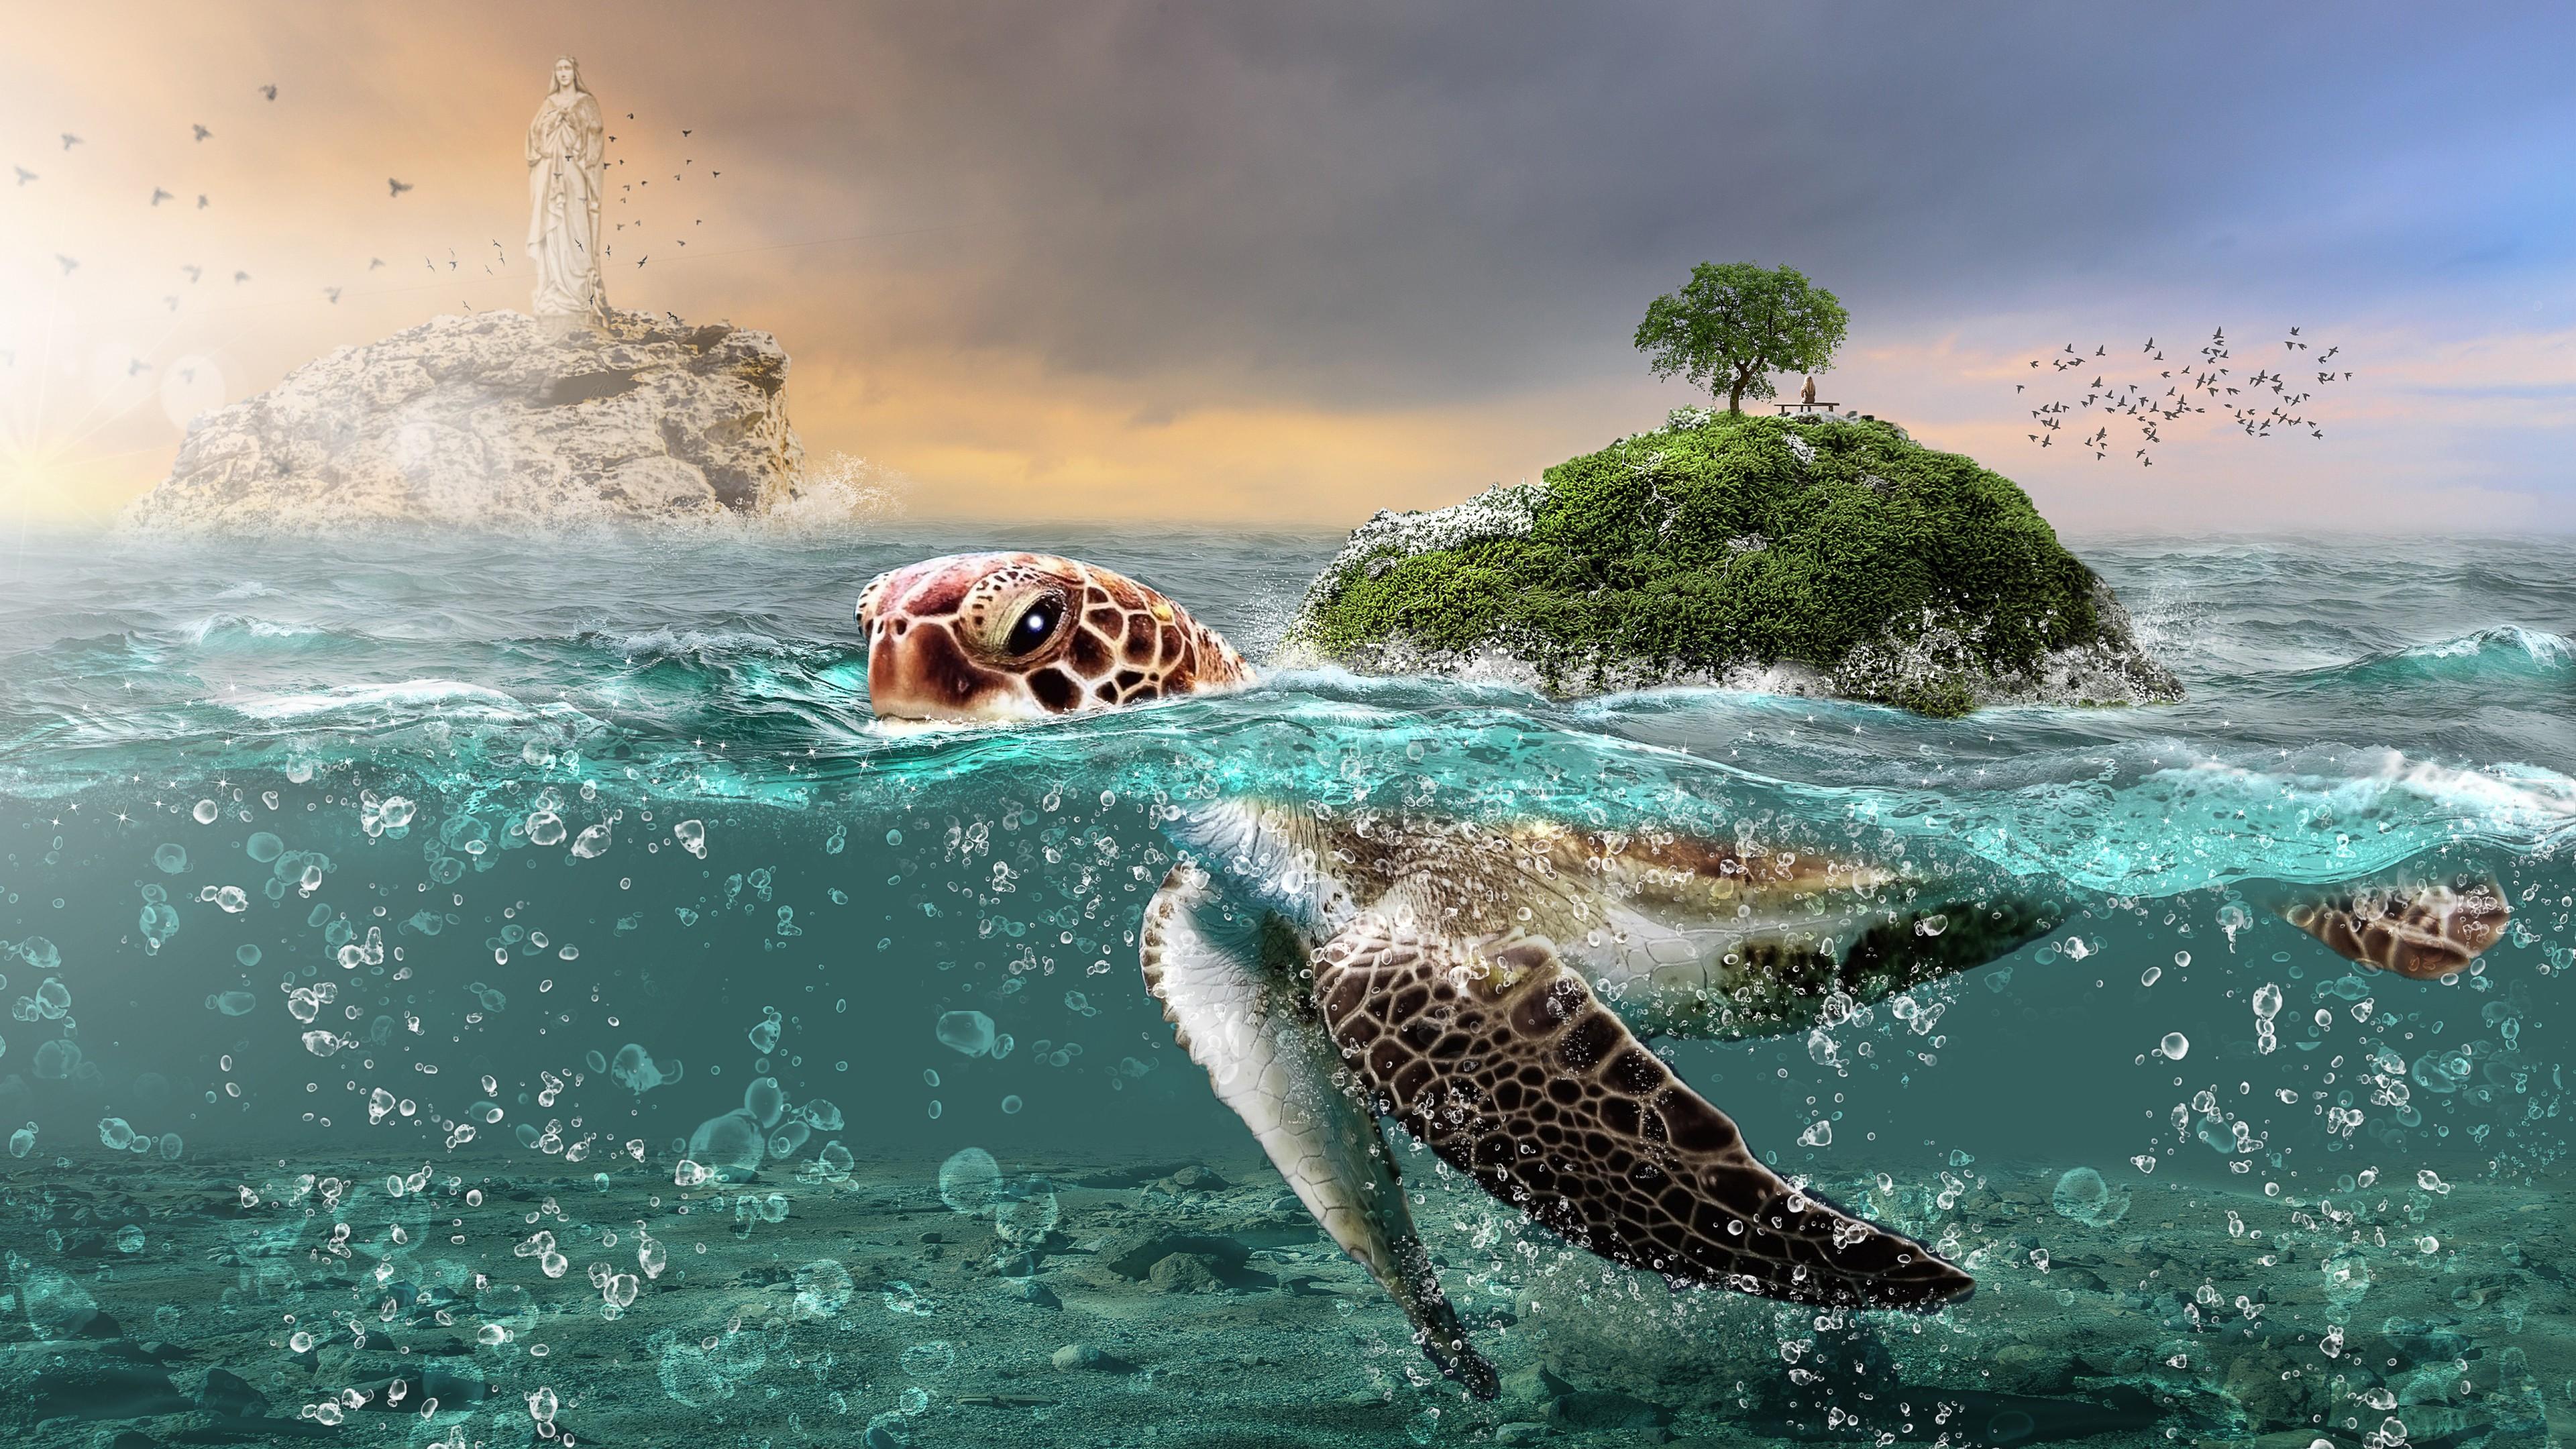 Cute Turtle Iphone Wallpaper Turtle Fantasy 5k Wallpapers Hd Wallpapers Id 27156